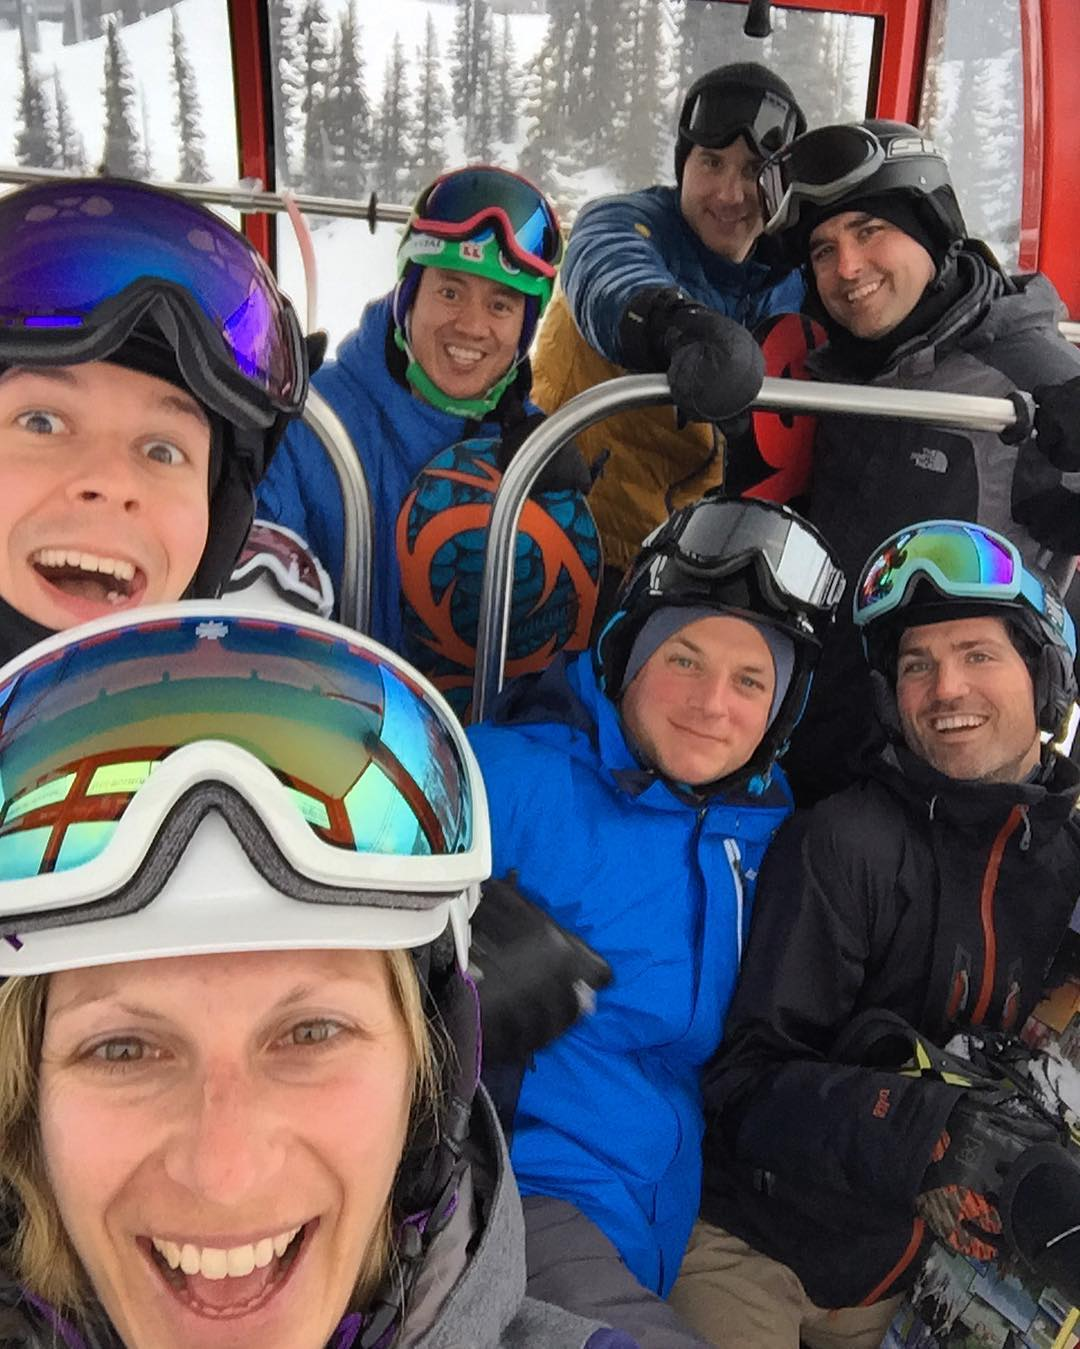 Gangs all here! #skitrip #whistler #peak2peak #snowboarding #happyshredding #happyplace #squadgoals